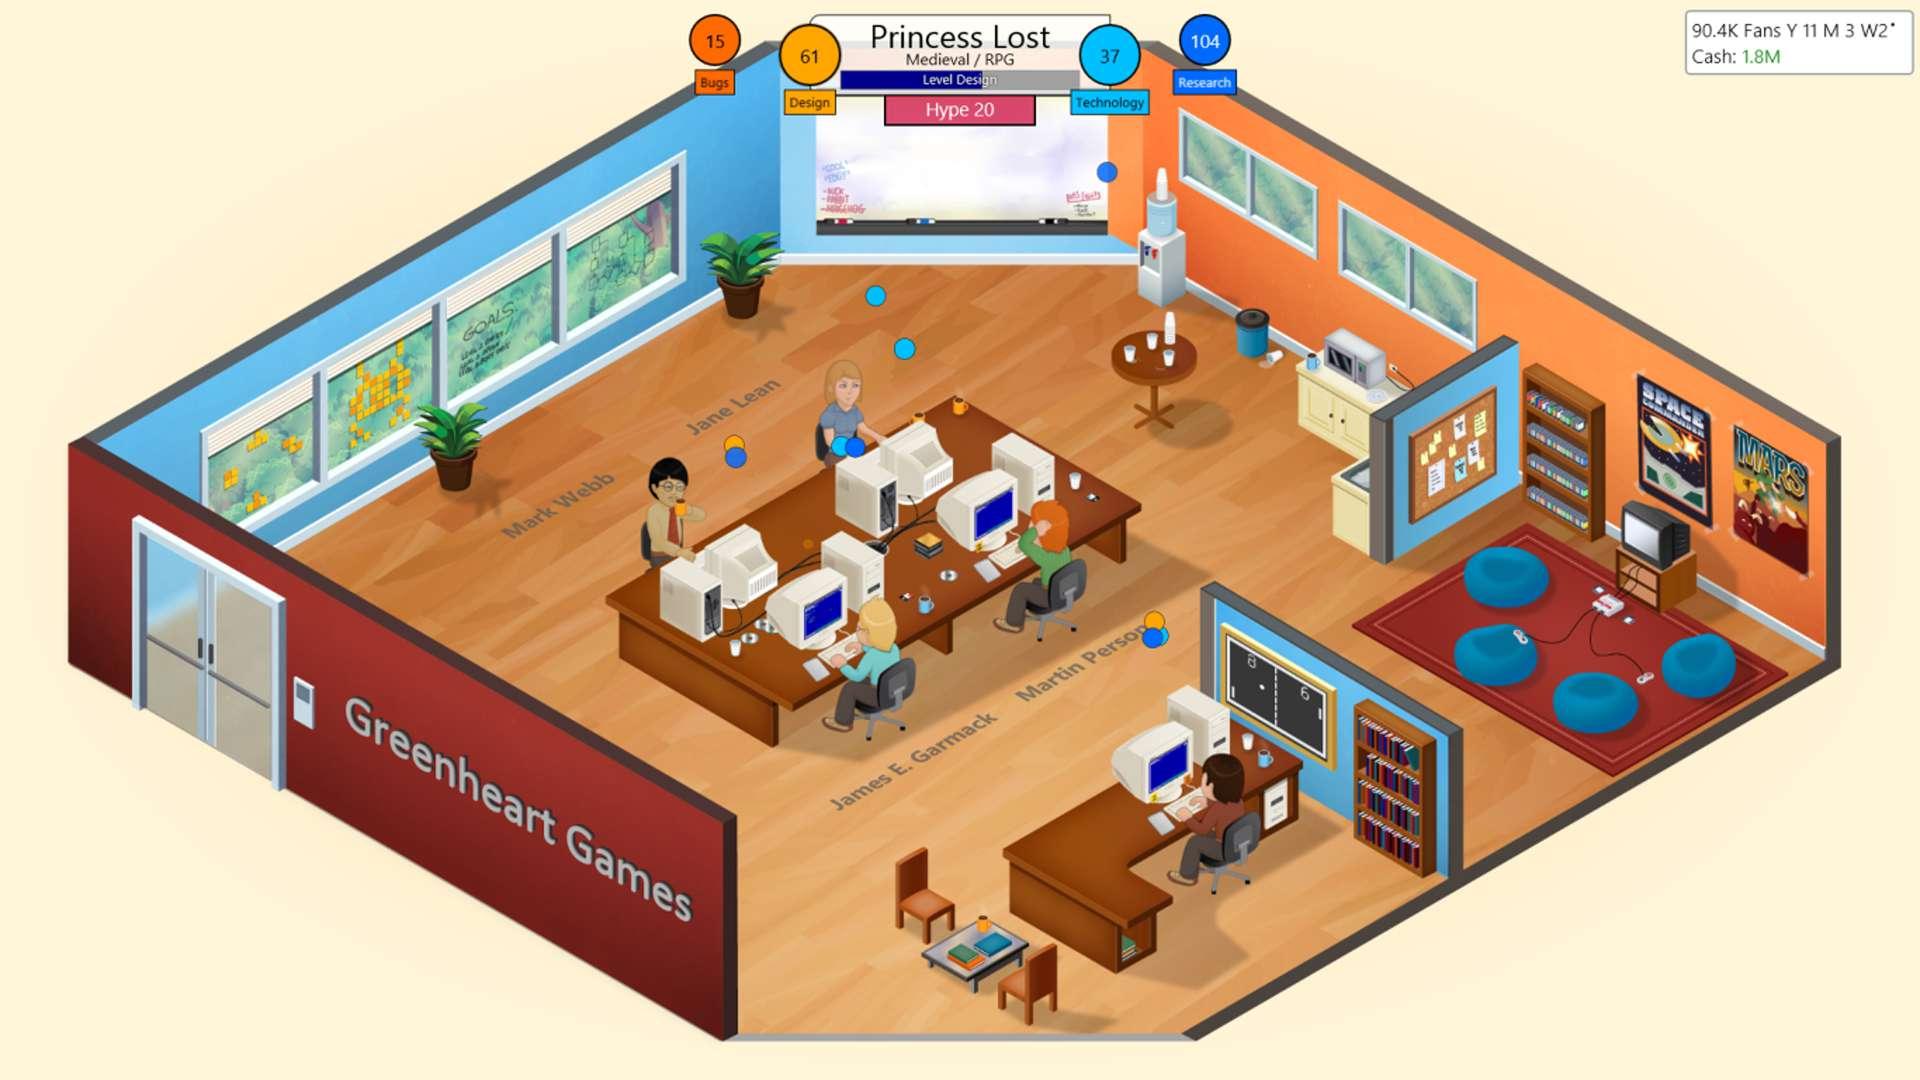 Game Dev Tycoon offline sim strategy video game.